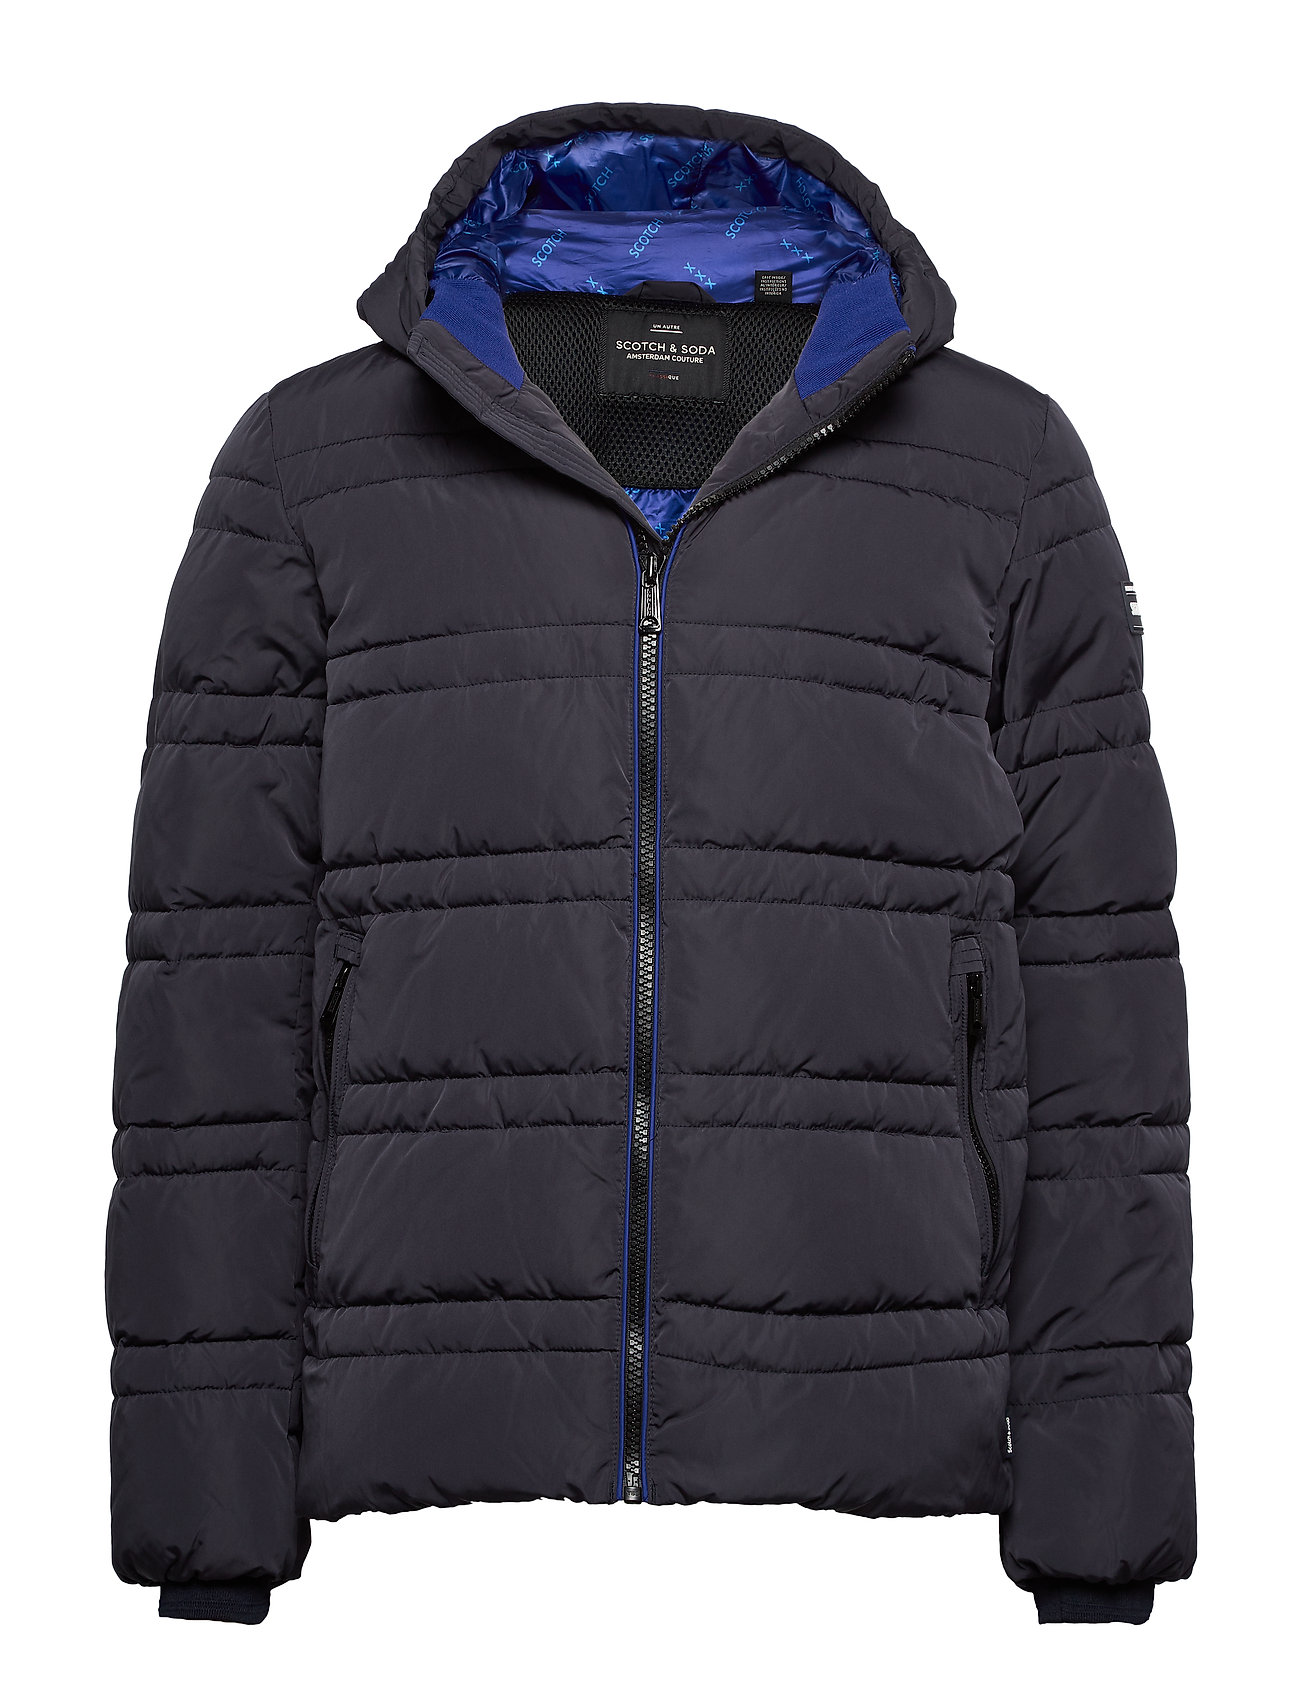 Scotch & Soda Classic hooded PrimaLoft jacket - NIGHT